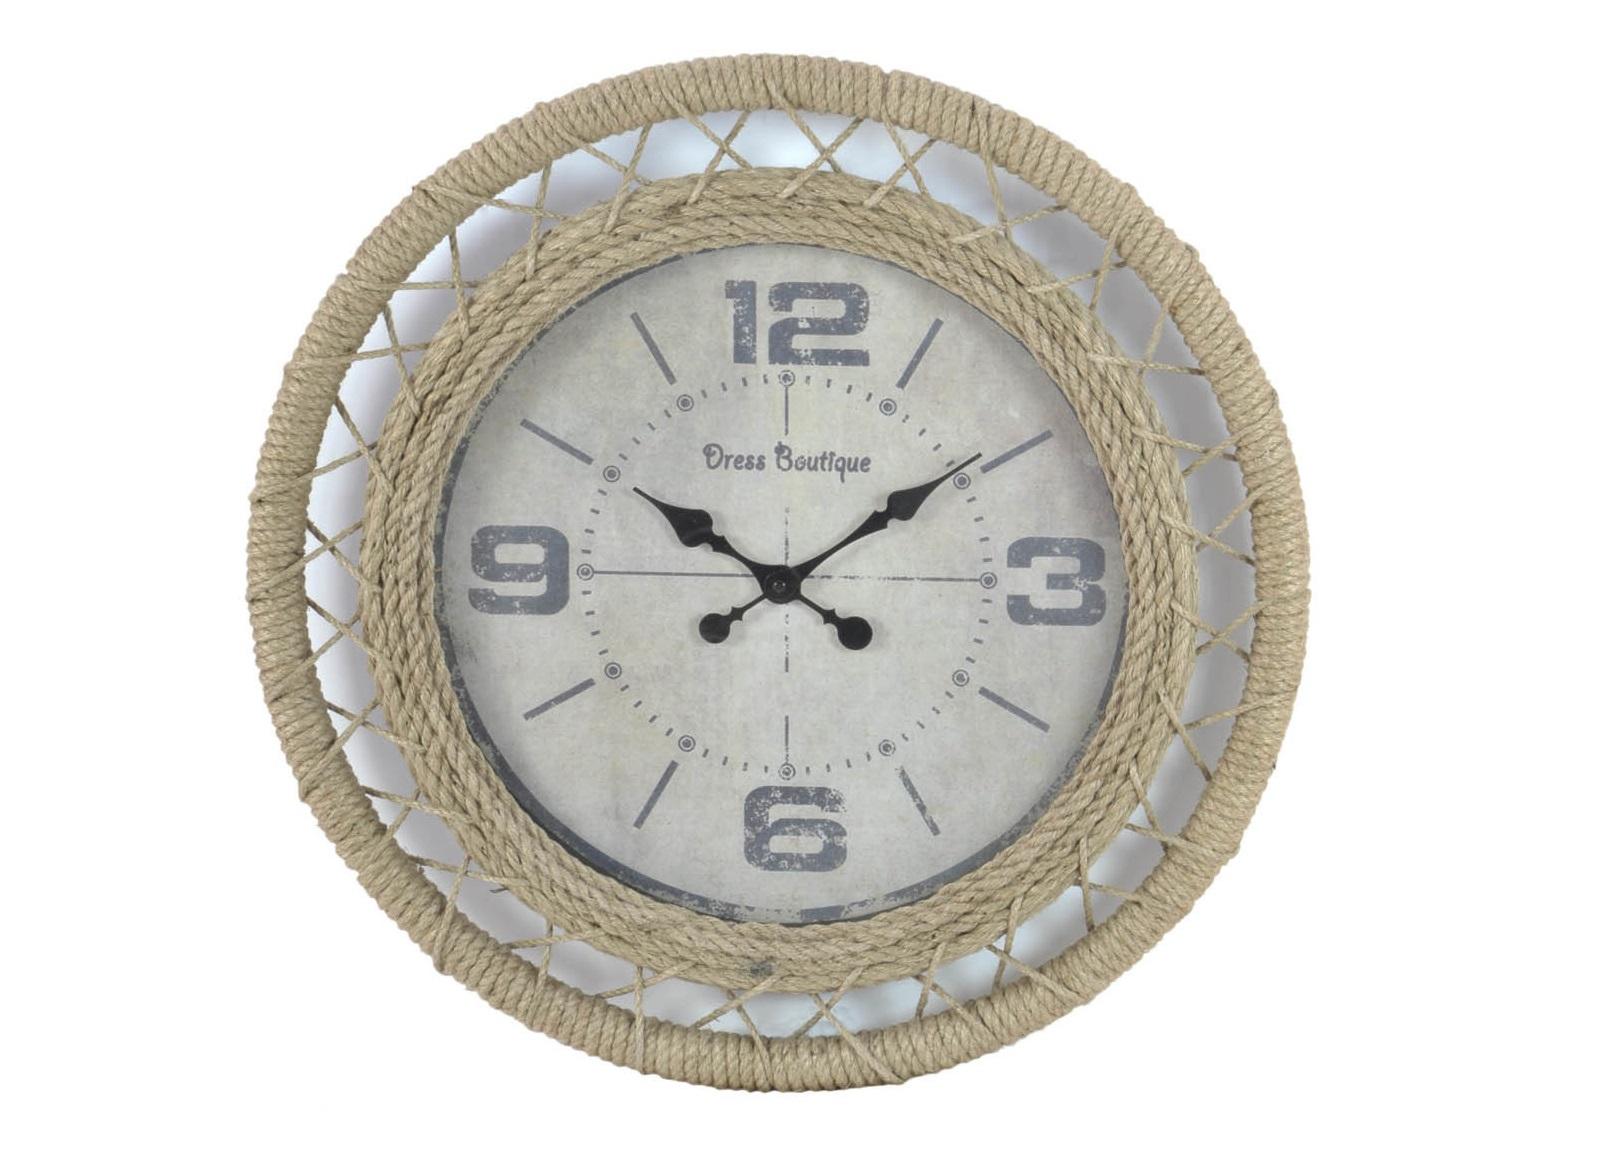 Часы настенные B?ccarНастенные часы<br>Часы настенные - кварцевый механизм&amp;lt;div&amp;gt;&amp;lt;br&amp;gt;&amp;lt;/div&amp;gt;&amp;lt;div&amp;gt;Материал: дерево, металл, джут&amp;lt;br&amp;gt;&amp;lt;/div&amp;gt;<br><br>Material: Джут<br>Width см: None<br>Depth см: 6<br>Height см: None<br>Diameter см: 60